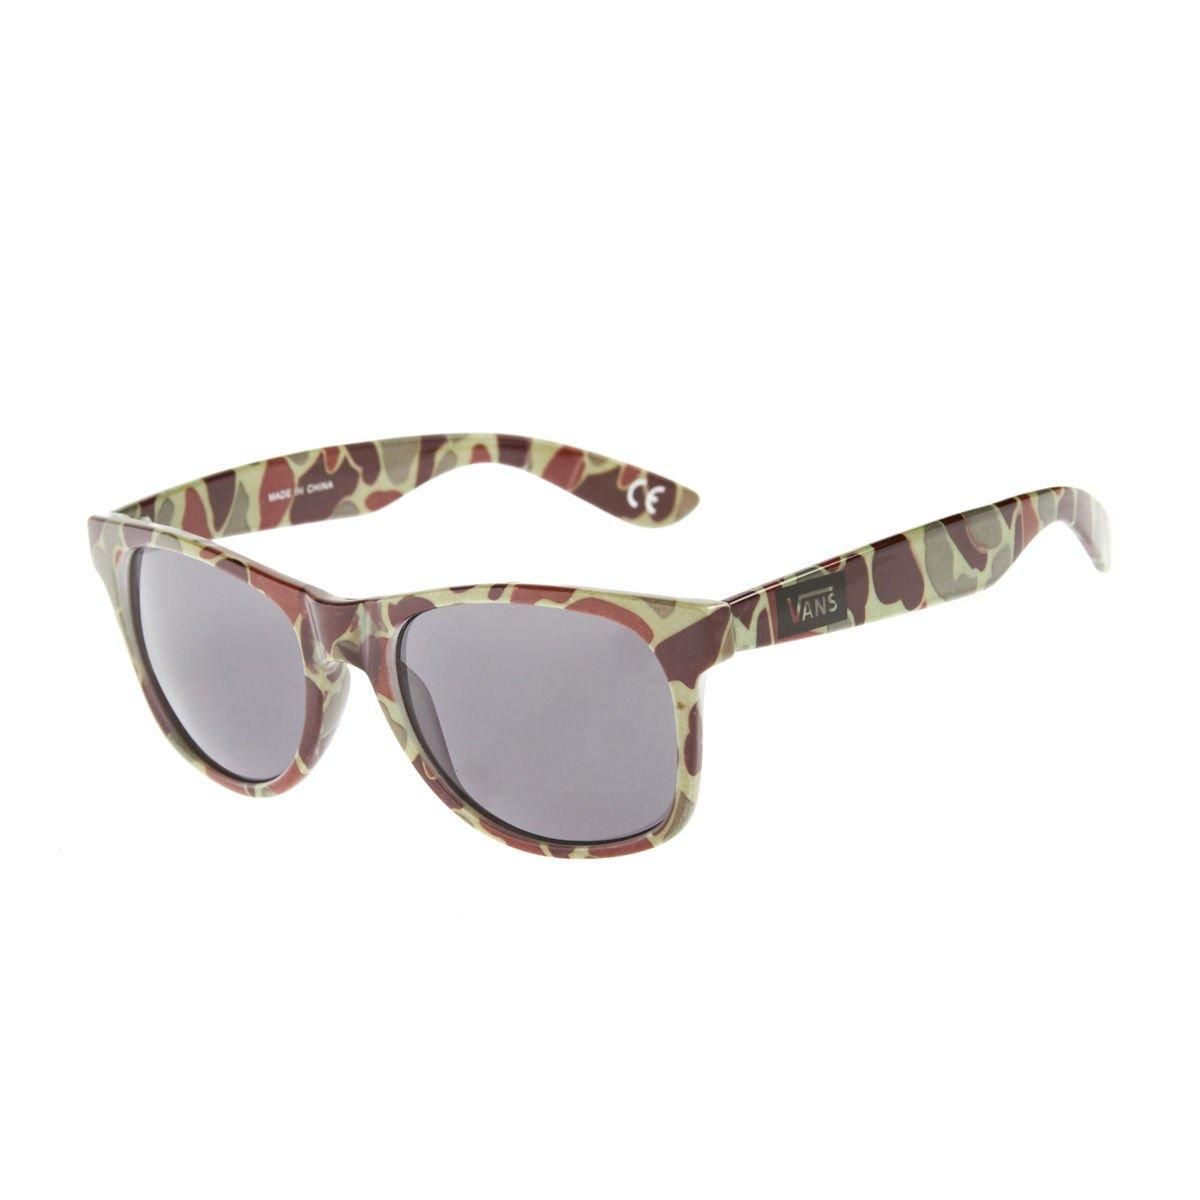 f715a46db3 Vans Spicoli 4 Sunglasses - Classic Camo  Amazon.co.uk  Clothing